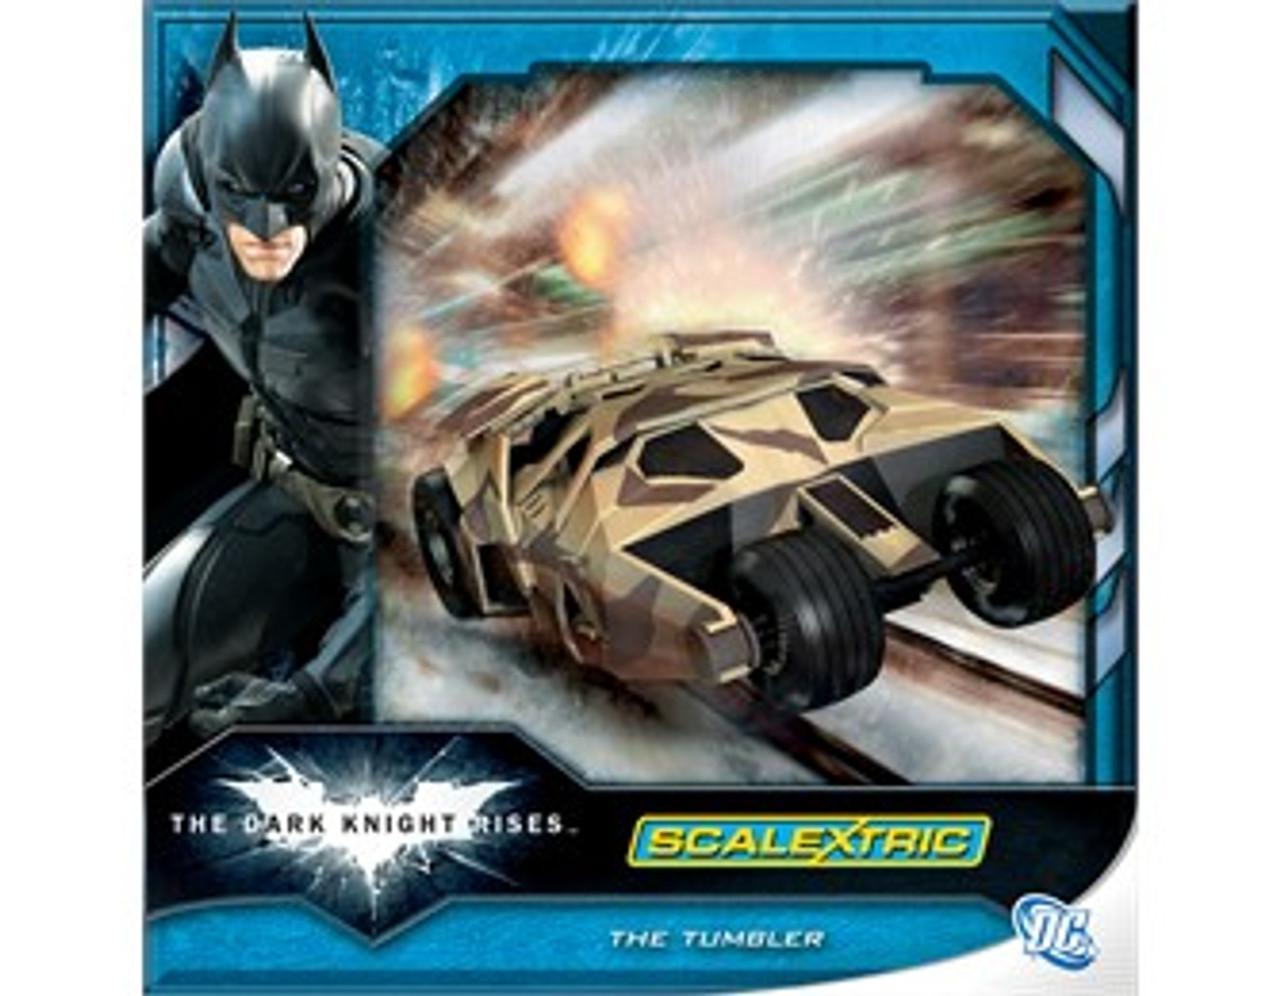 Scalextric C3333A Batman-The Tumbler The Dark Knight Riser Slot Car Accessories (C3333A)